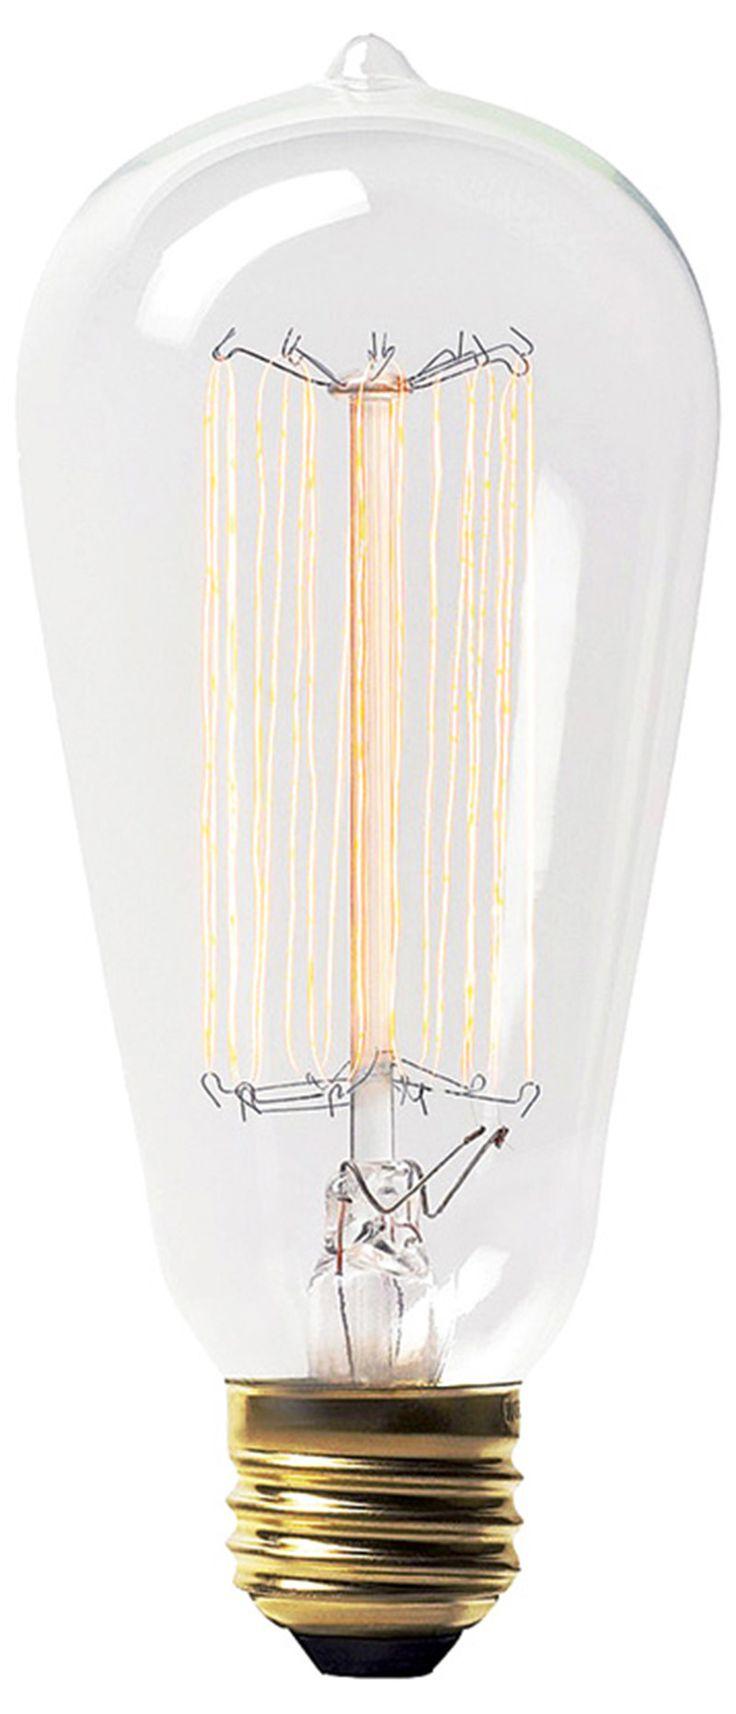 Teardrop st64 william and watson vintage edison bulb industrial light - Ren Wil Lb001 3 Lb001 Retro Light Bulb